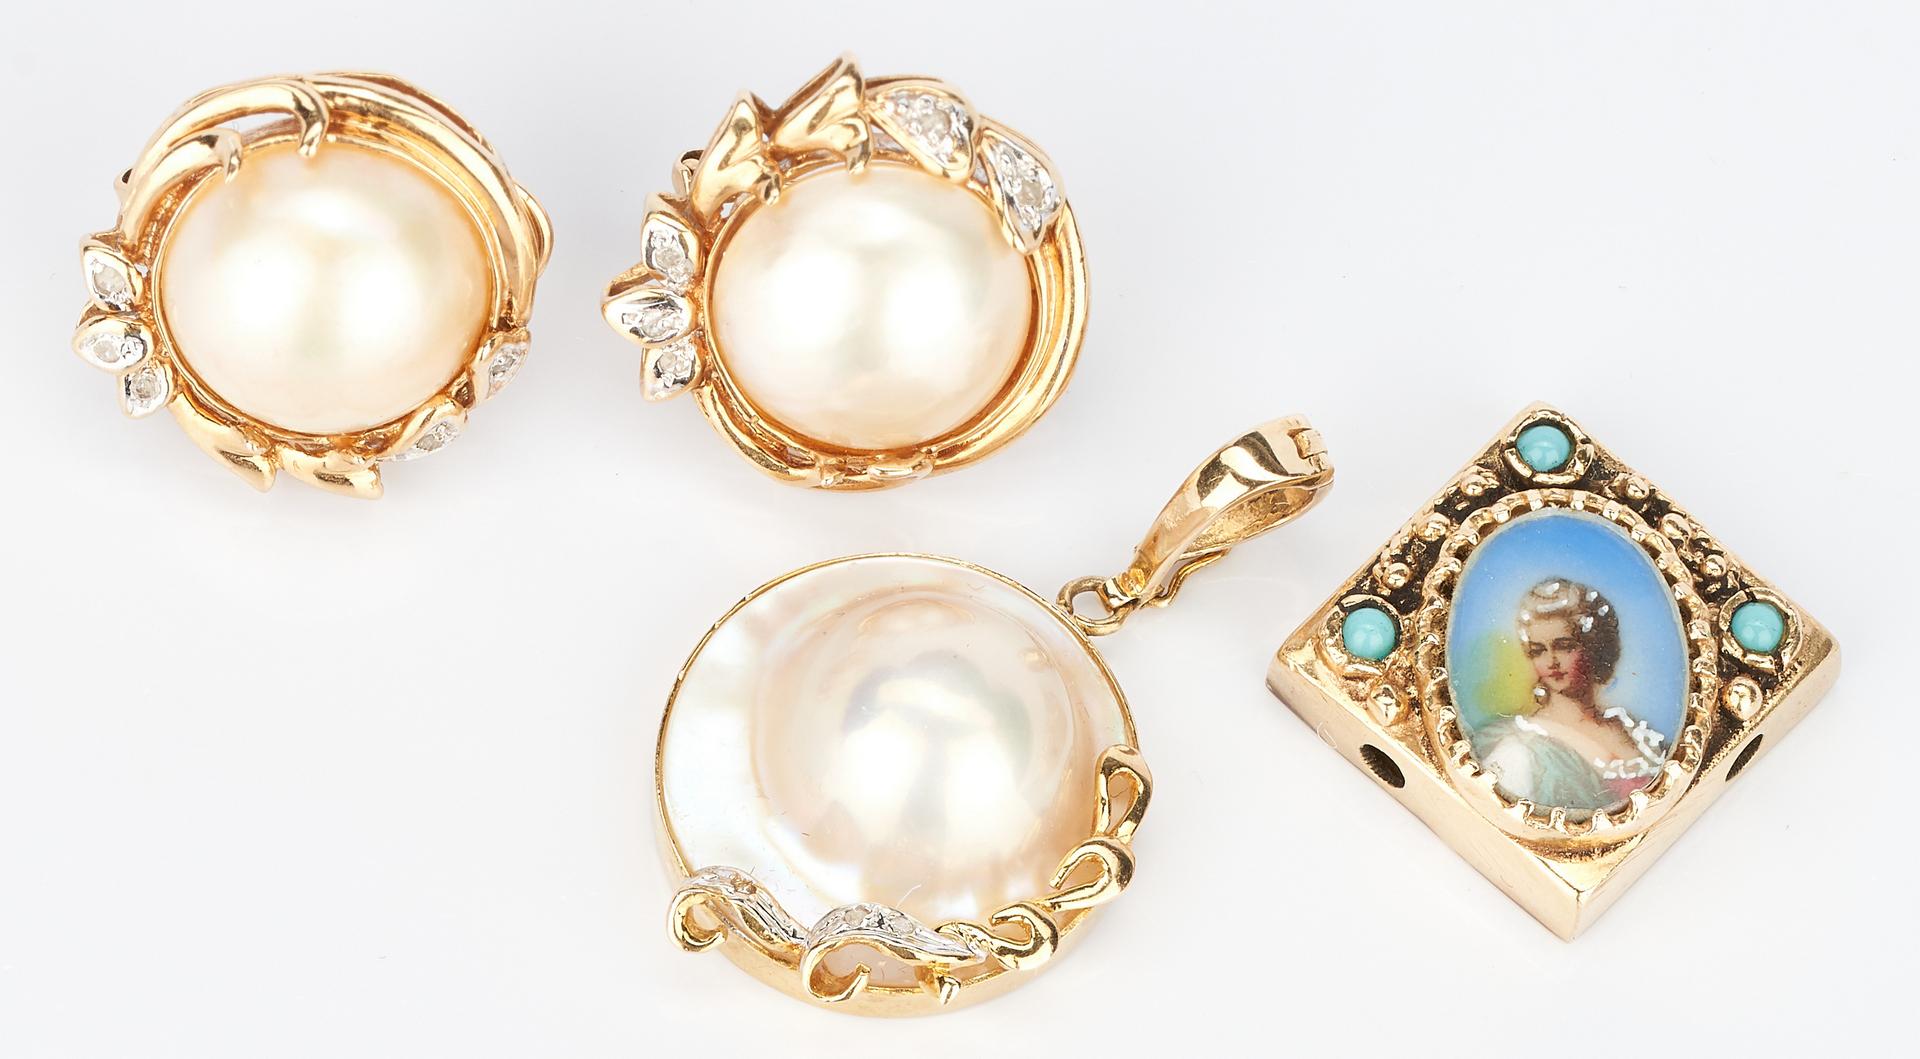 Lot 1014: 3 Gold & Gemstone Items, incl. Diamond & Pearl